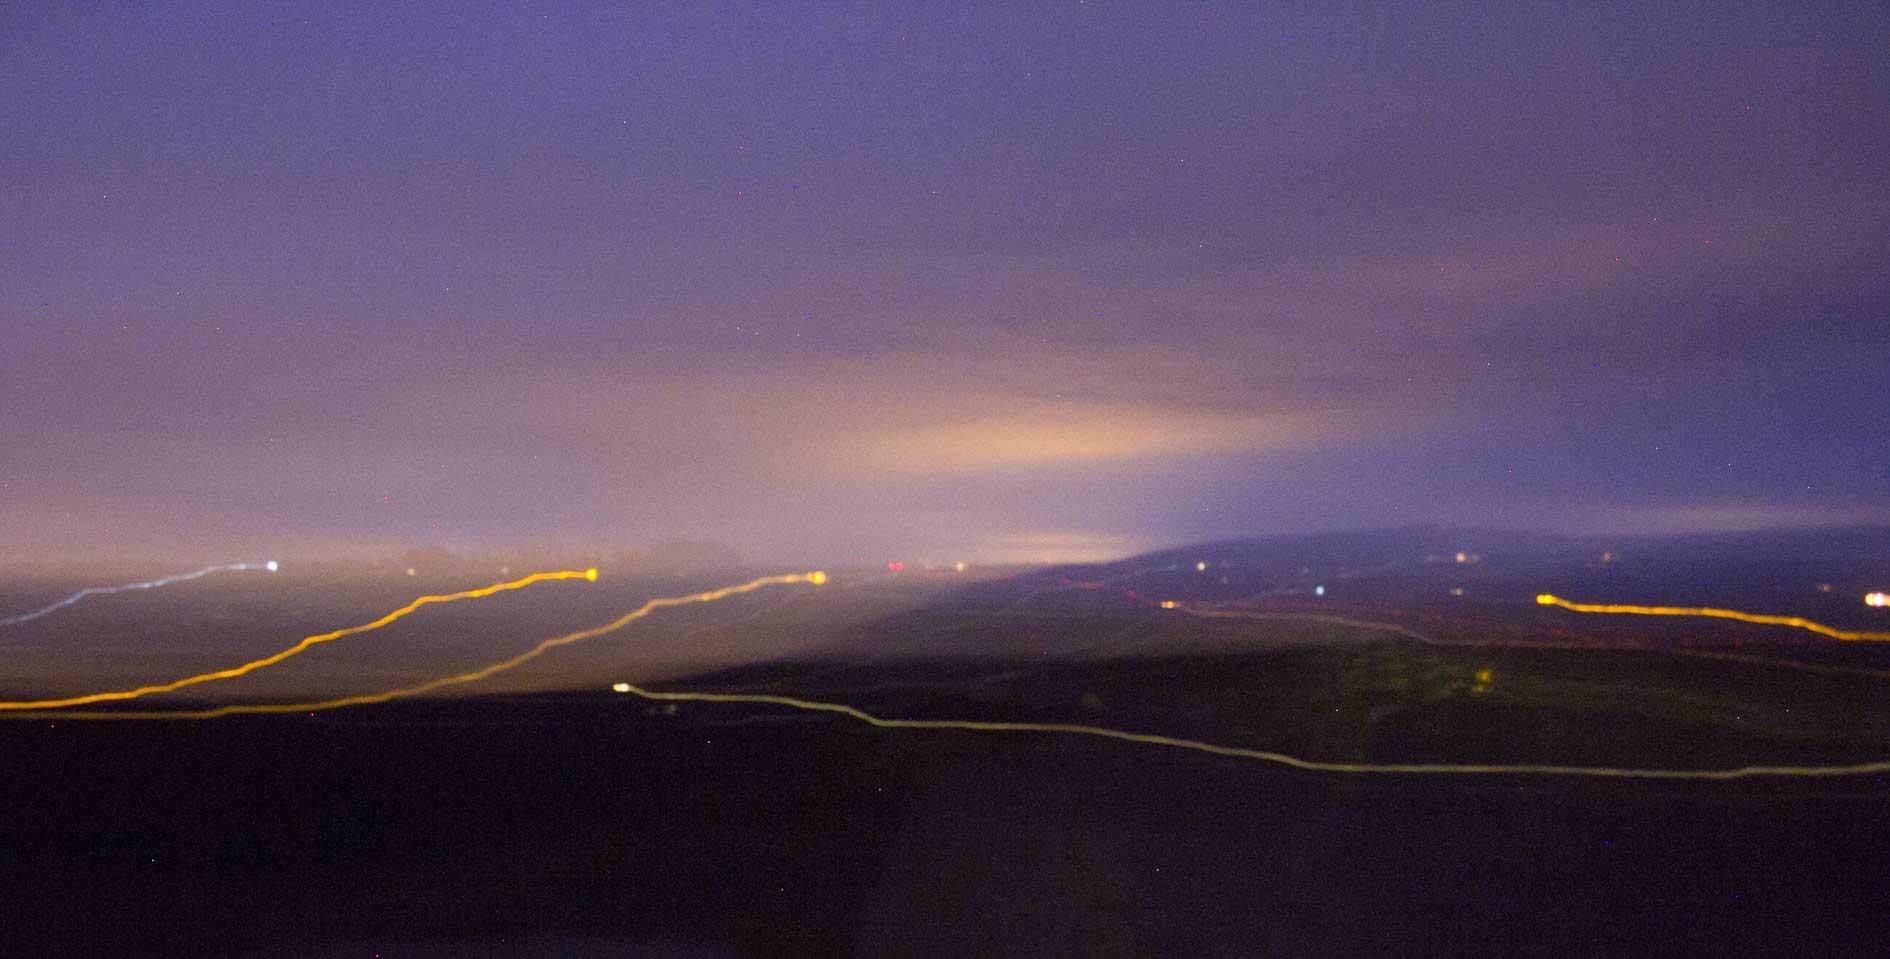 aurora-and-light-painting-7.jpg